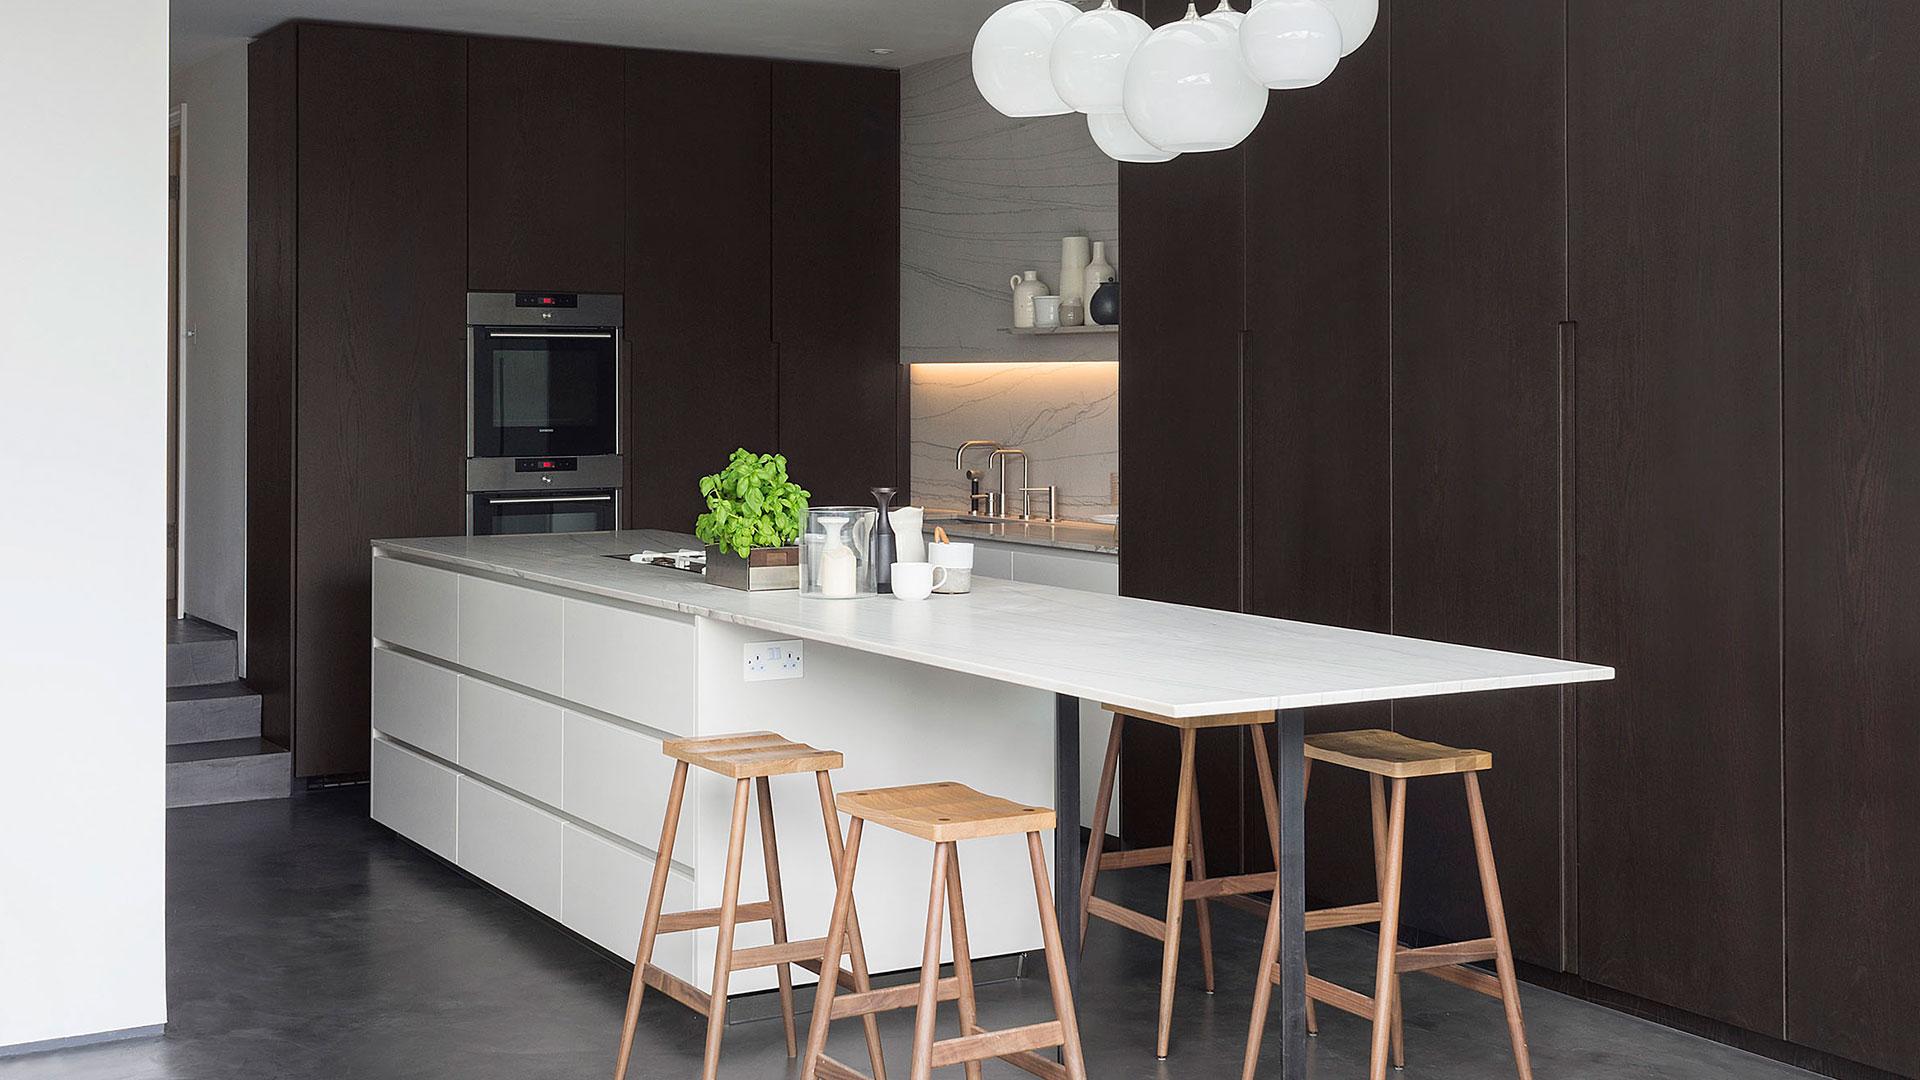 Cucina con isola con top in pietra integrata in uno spazio ...